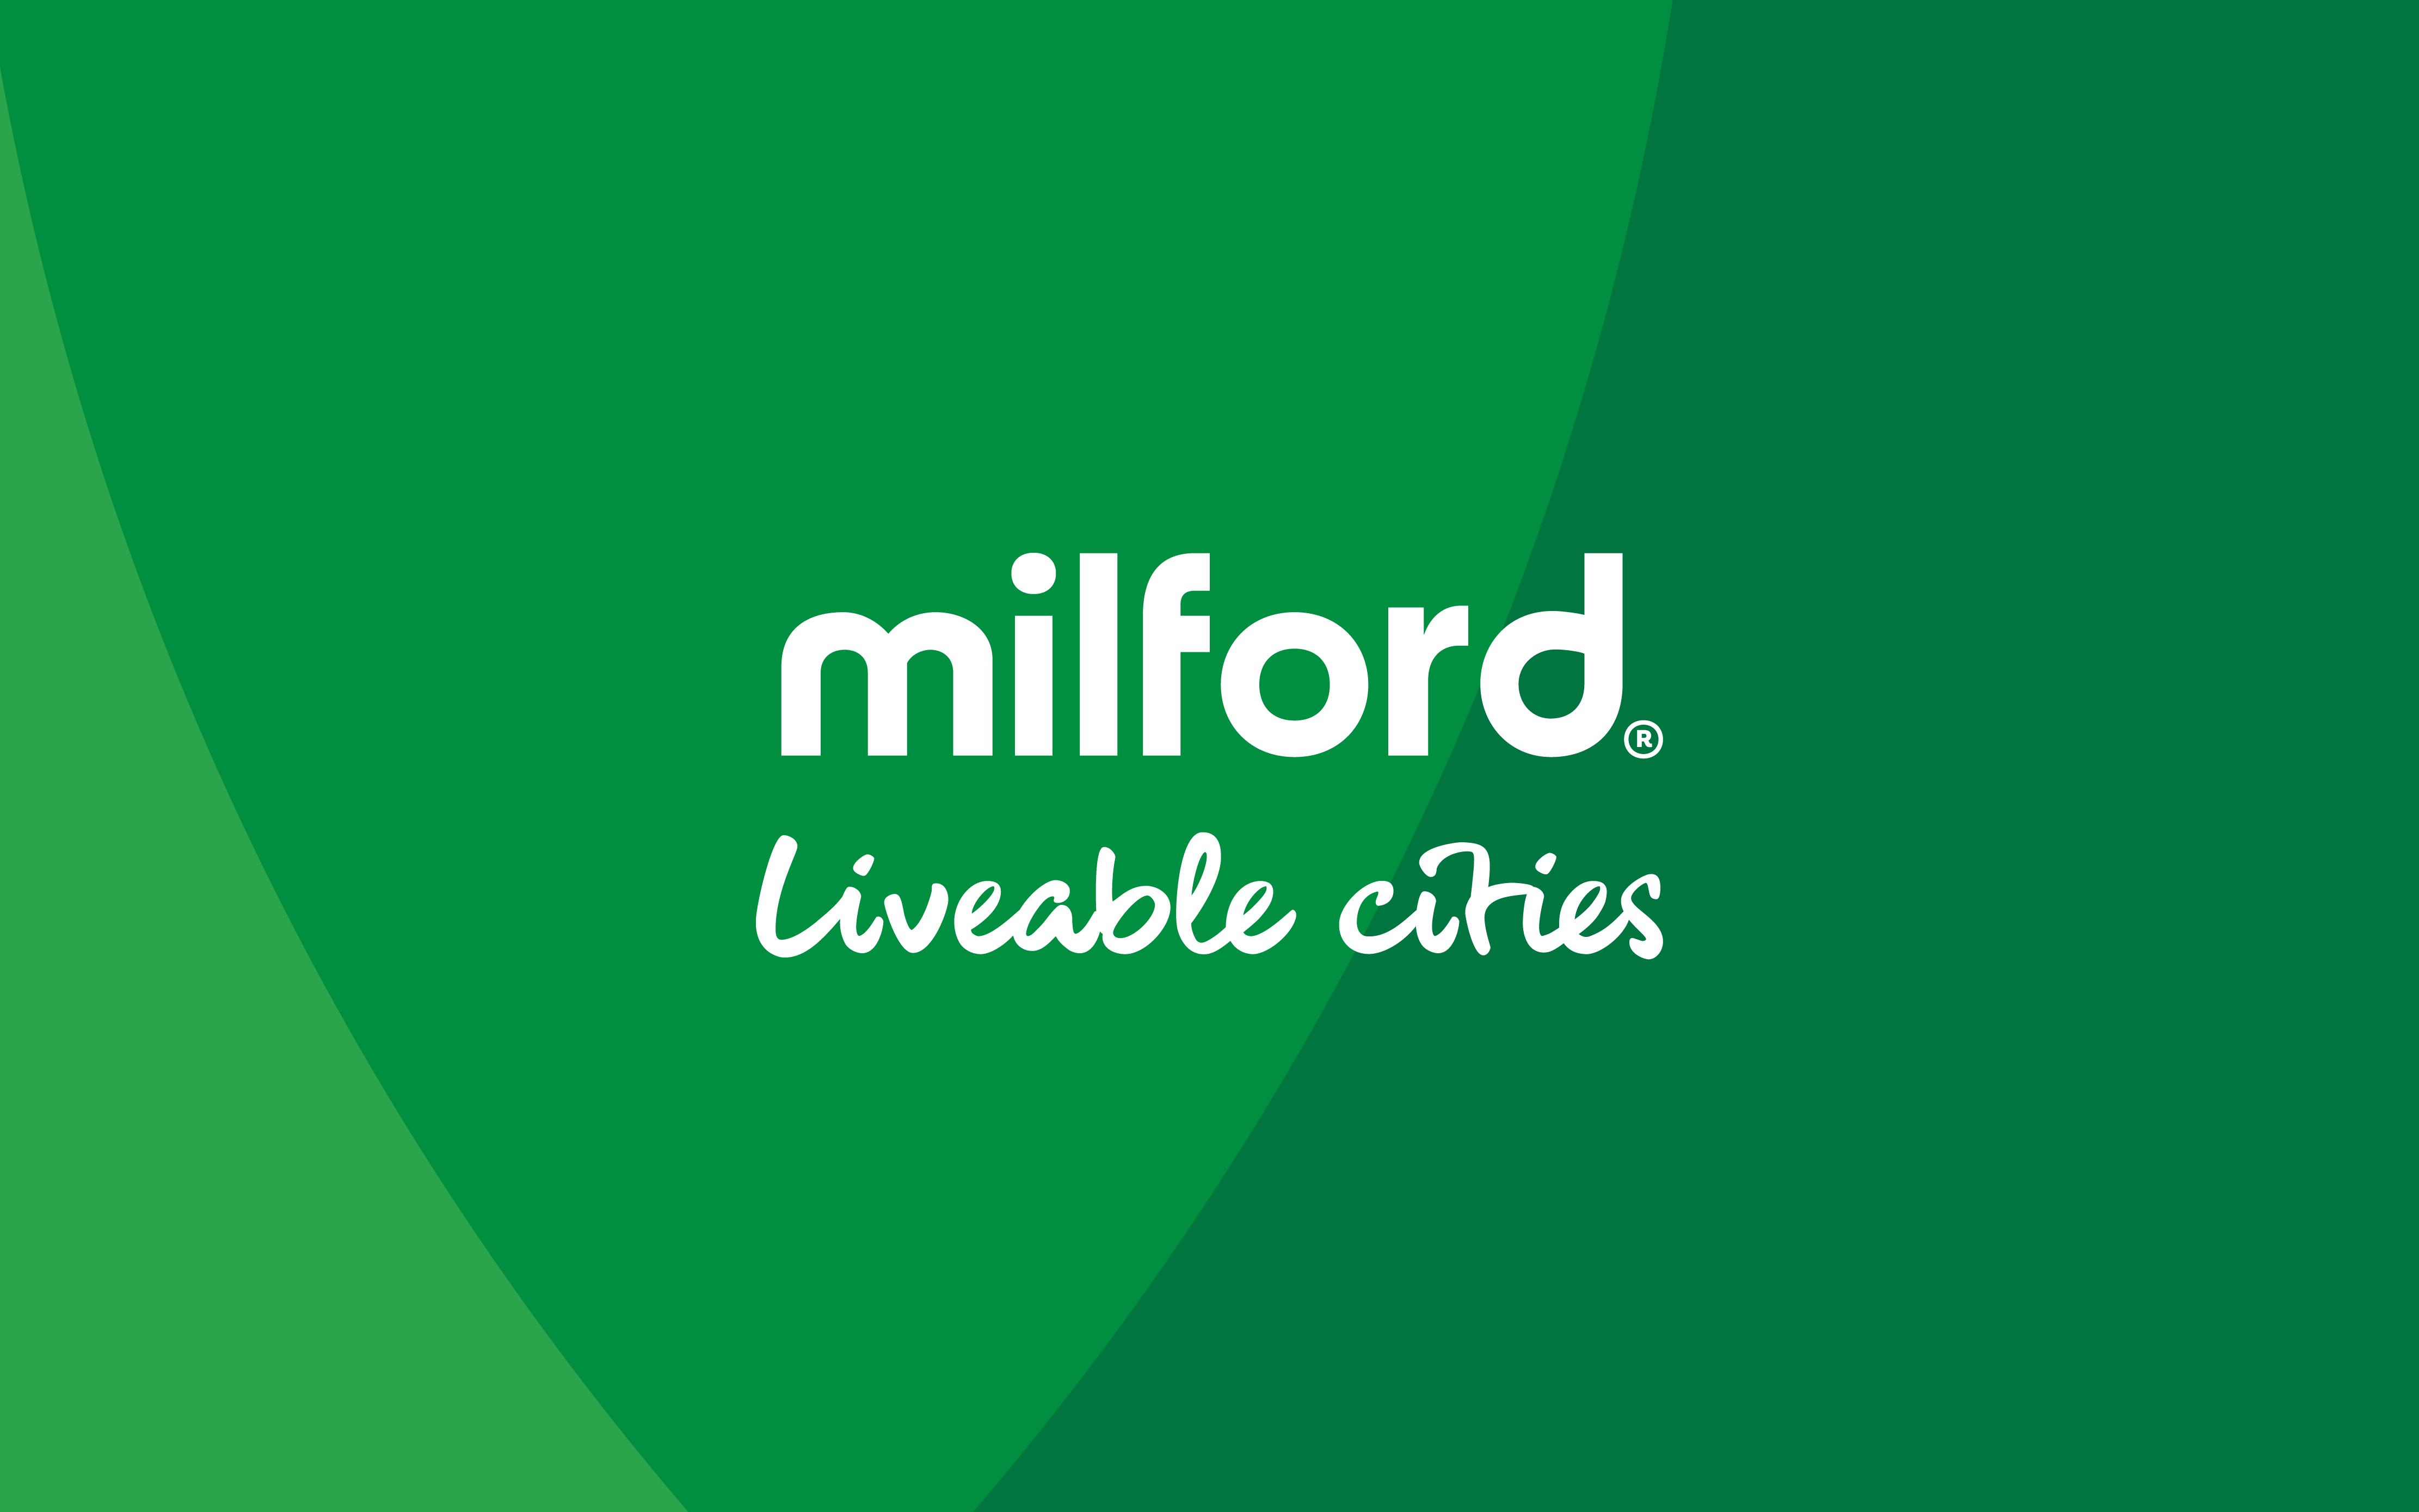 the milford logo